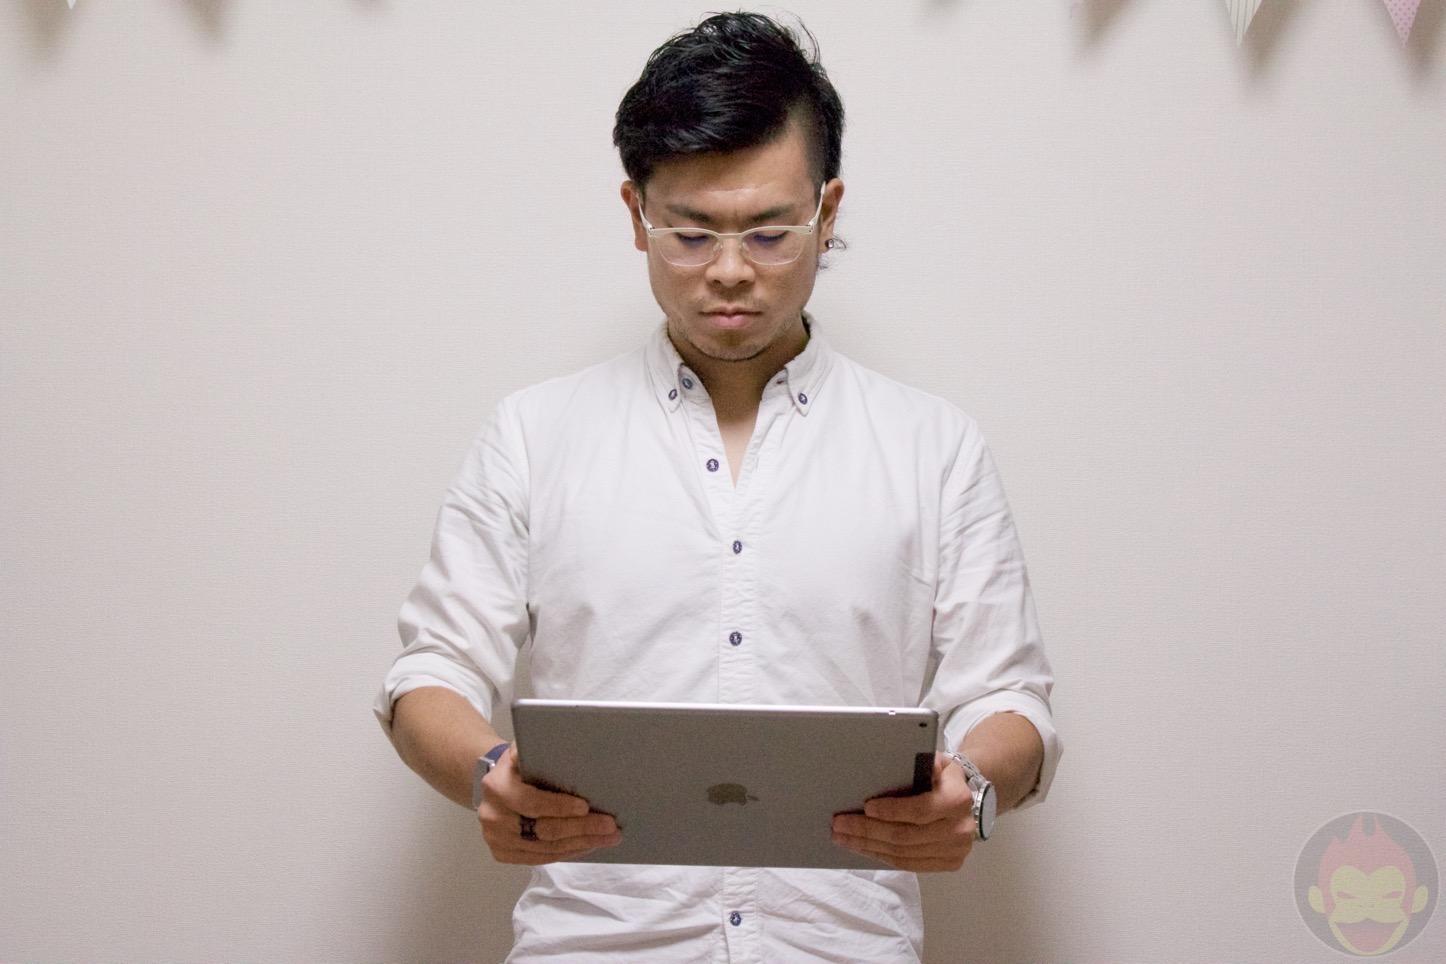 iPad-Pro-Air2-mini2-Comparison-005.jpg